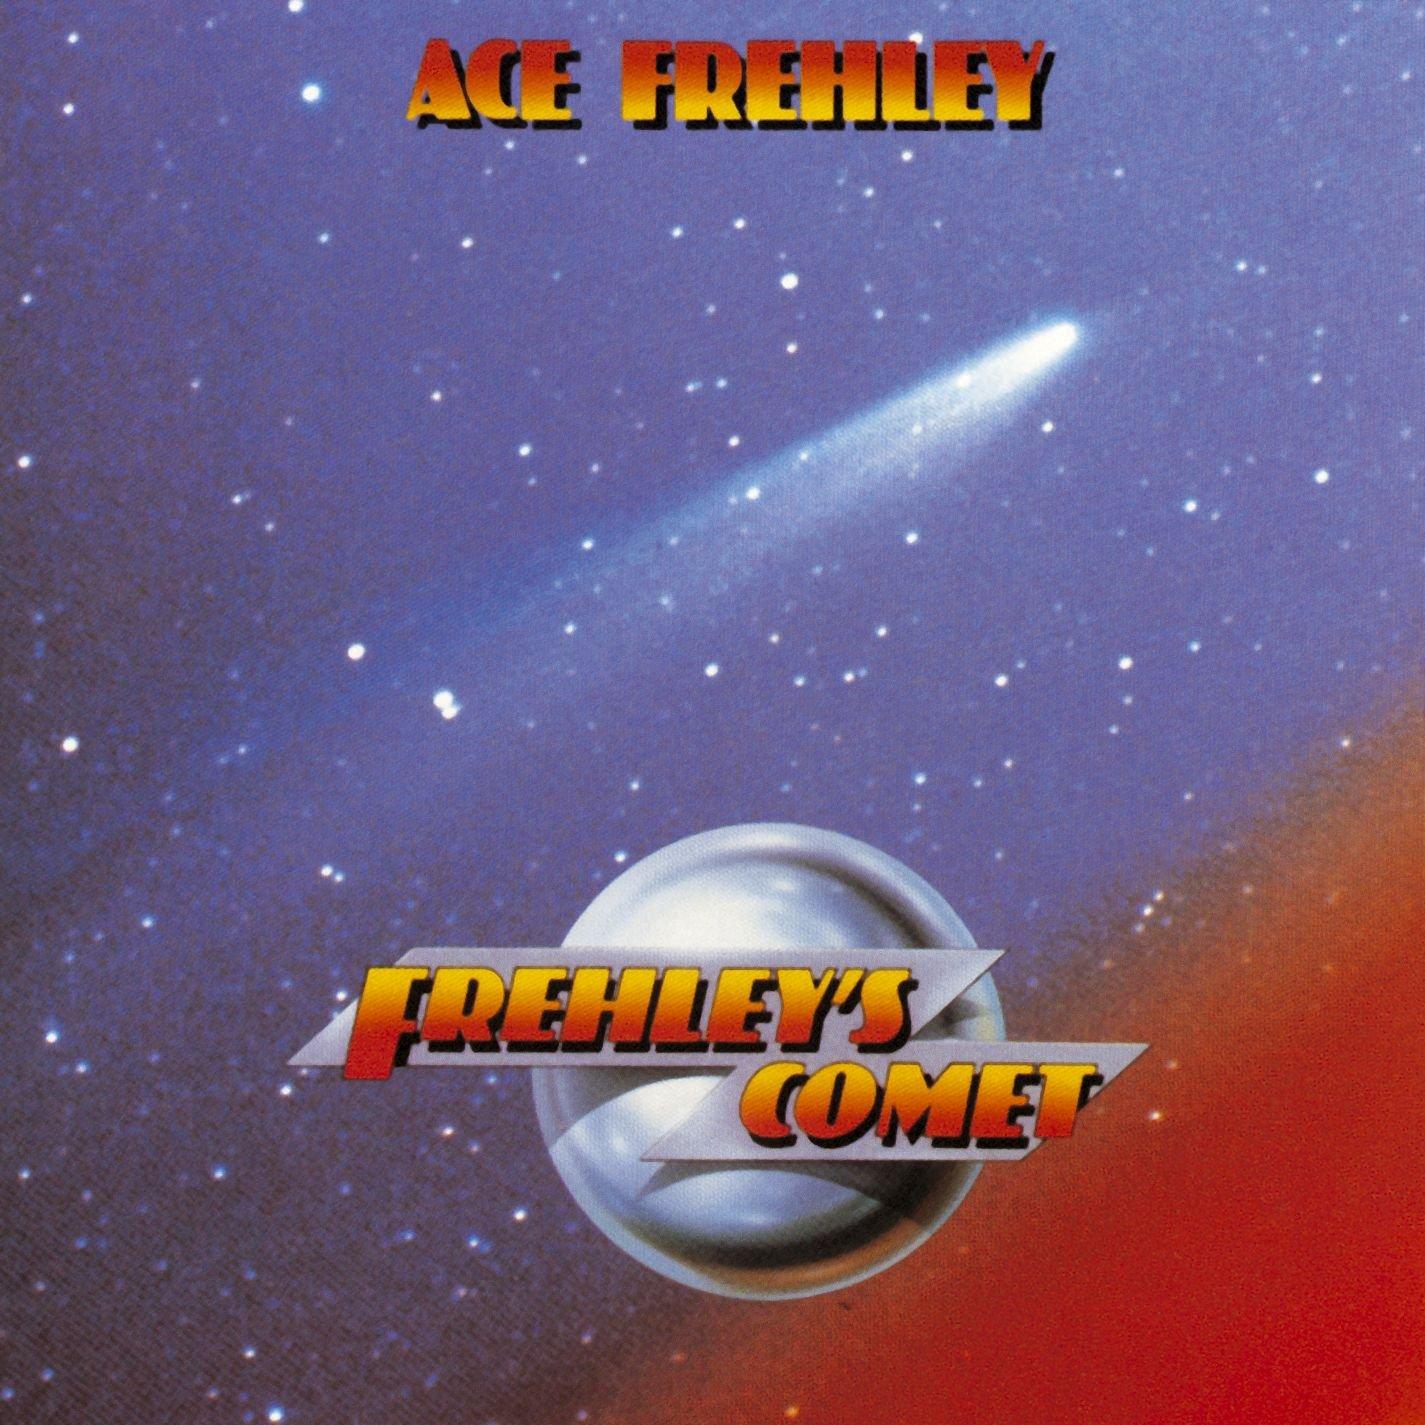 Latest Sale item item Frehley's Comet